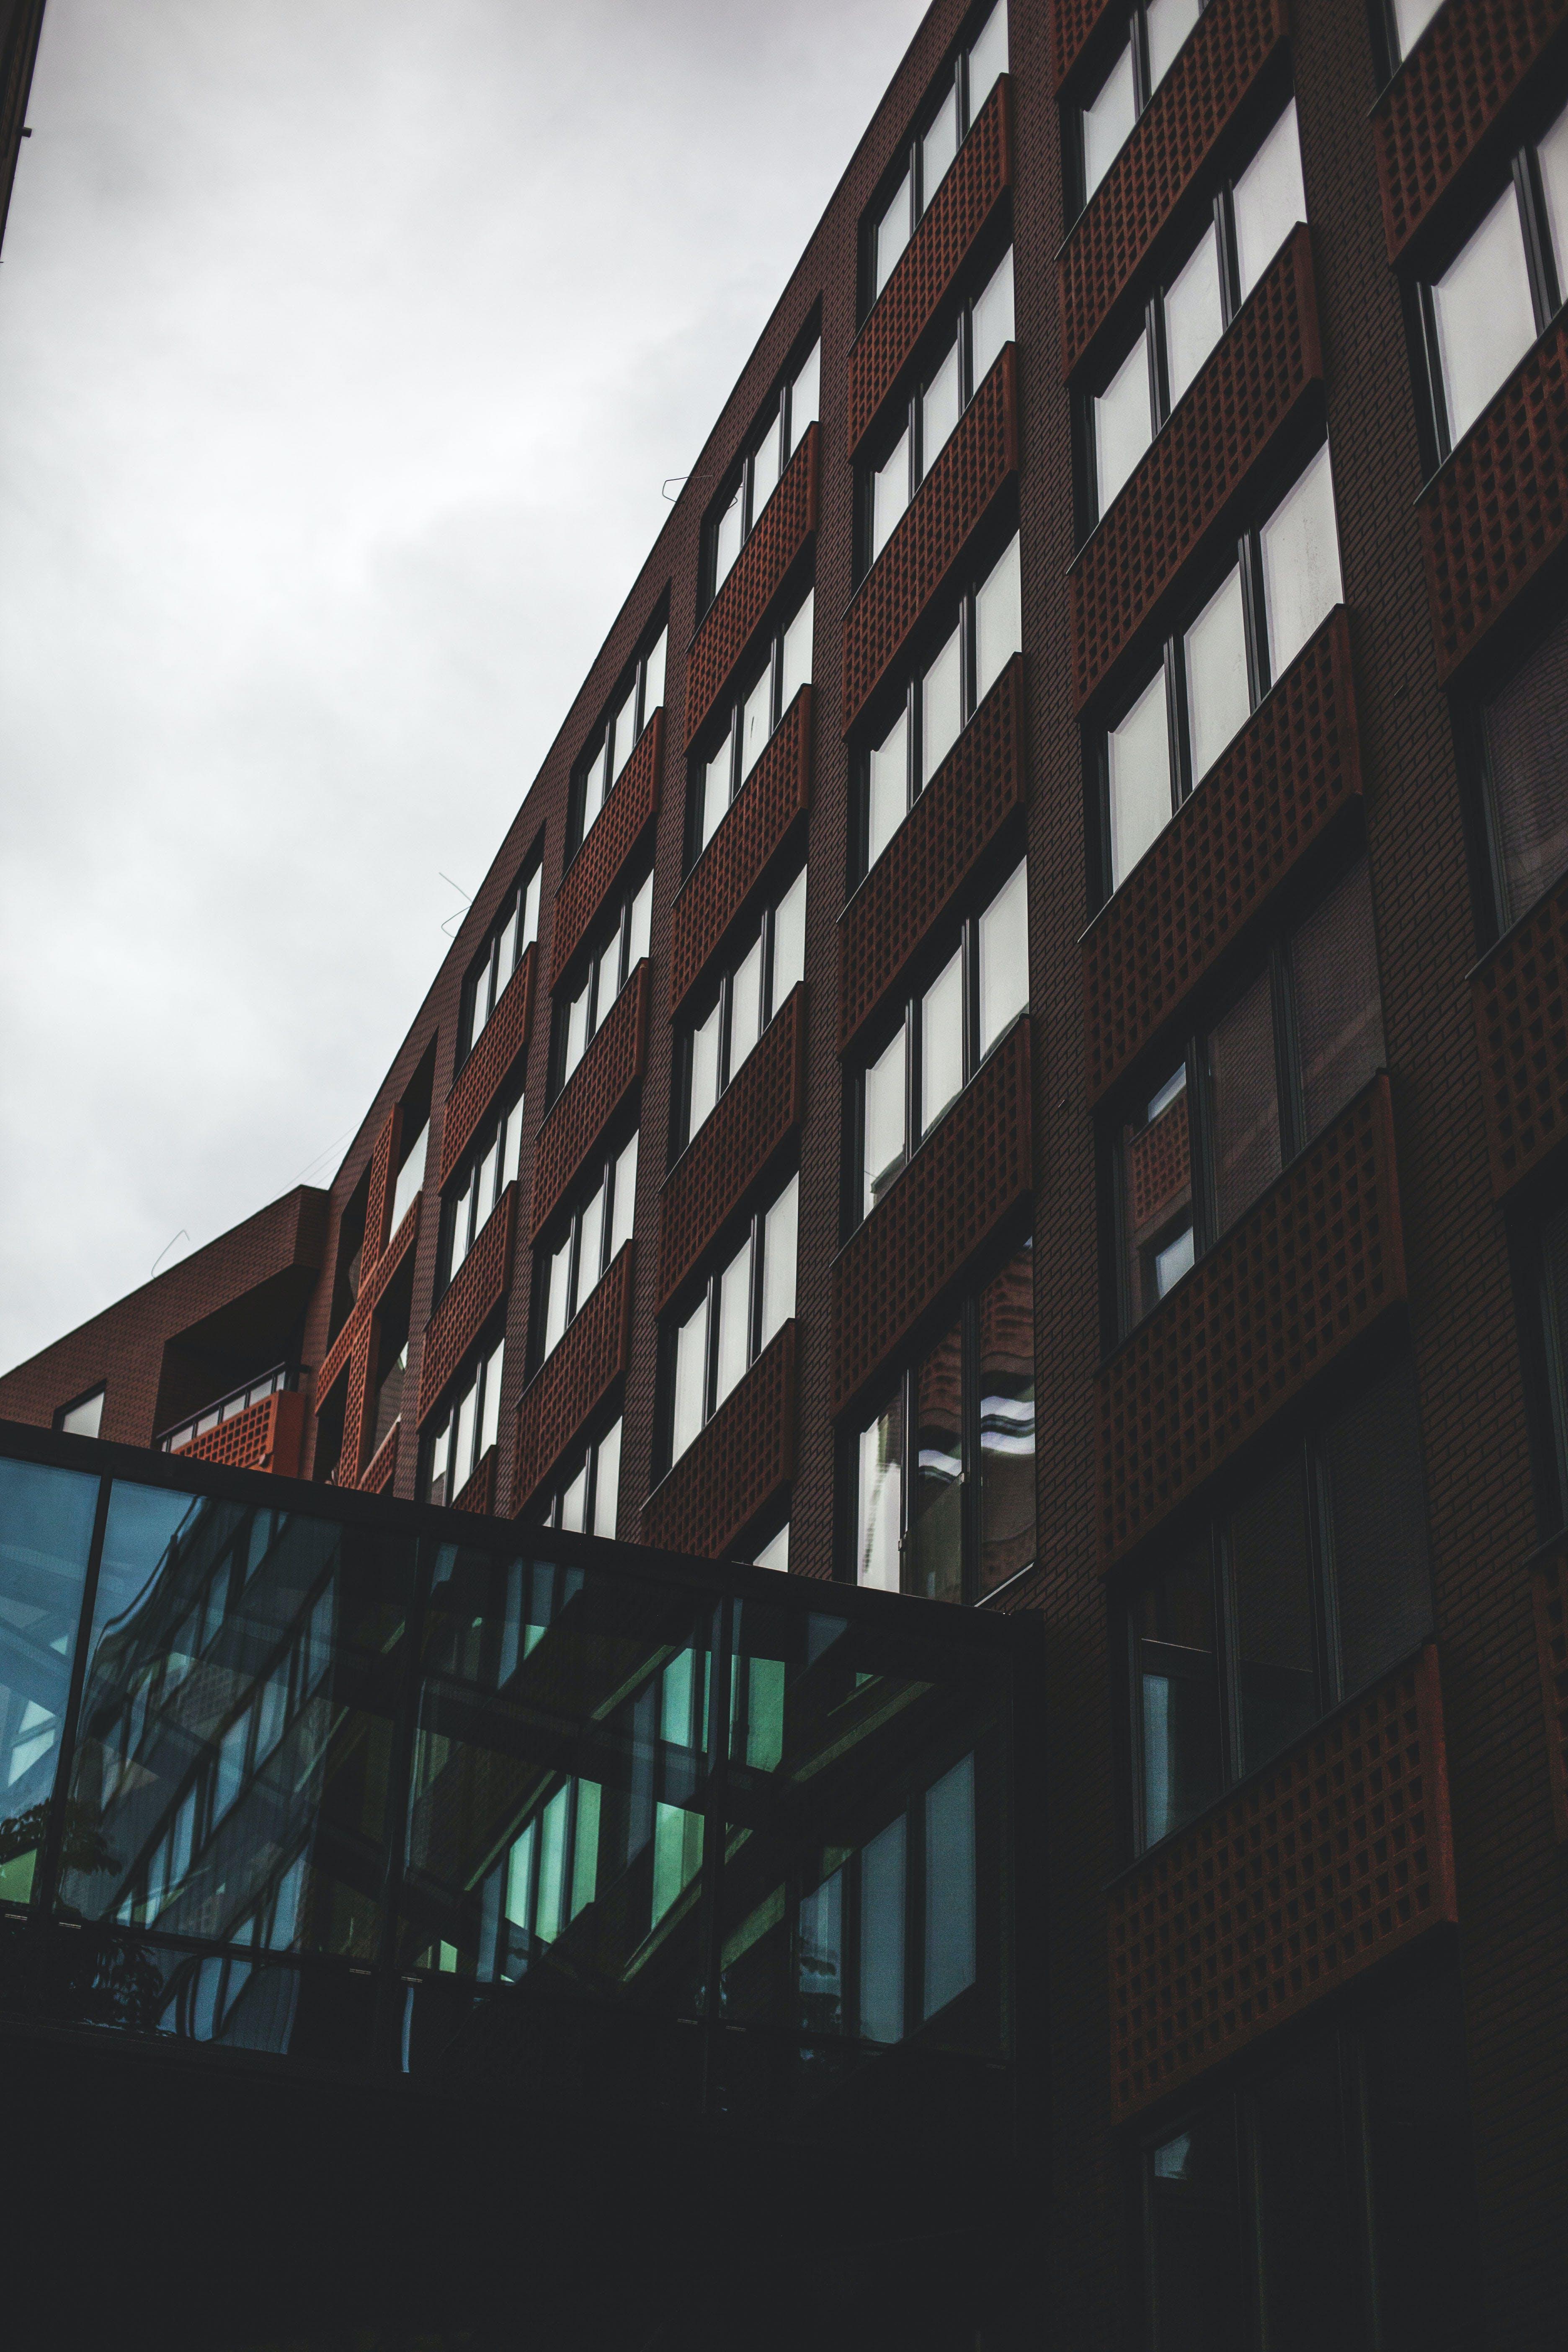 Free stock photo of architecture, architecture. city, blue, brick texture